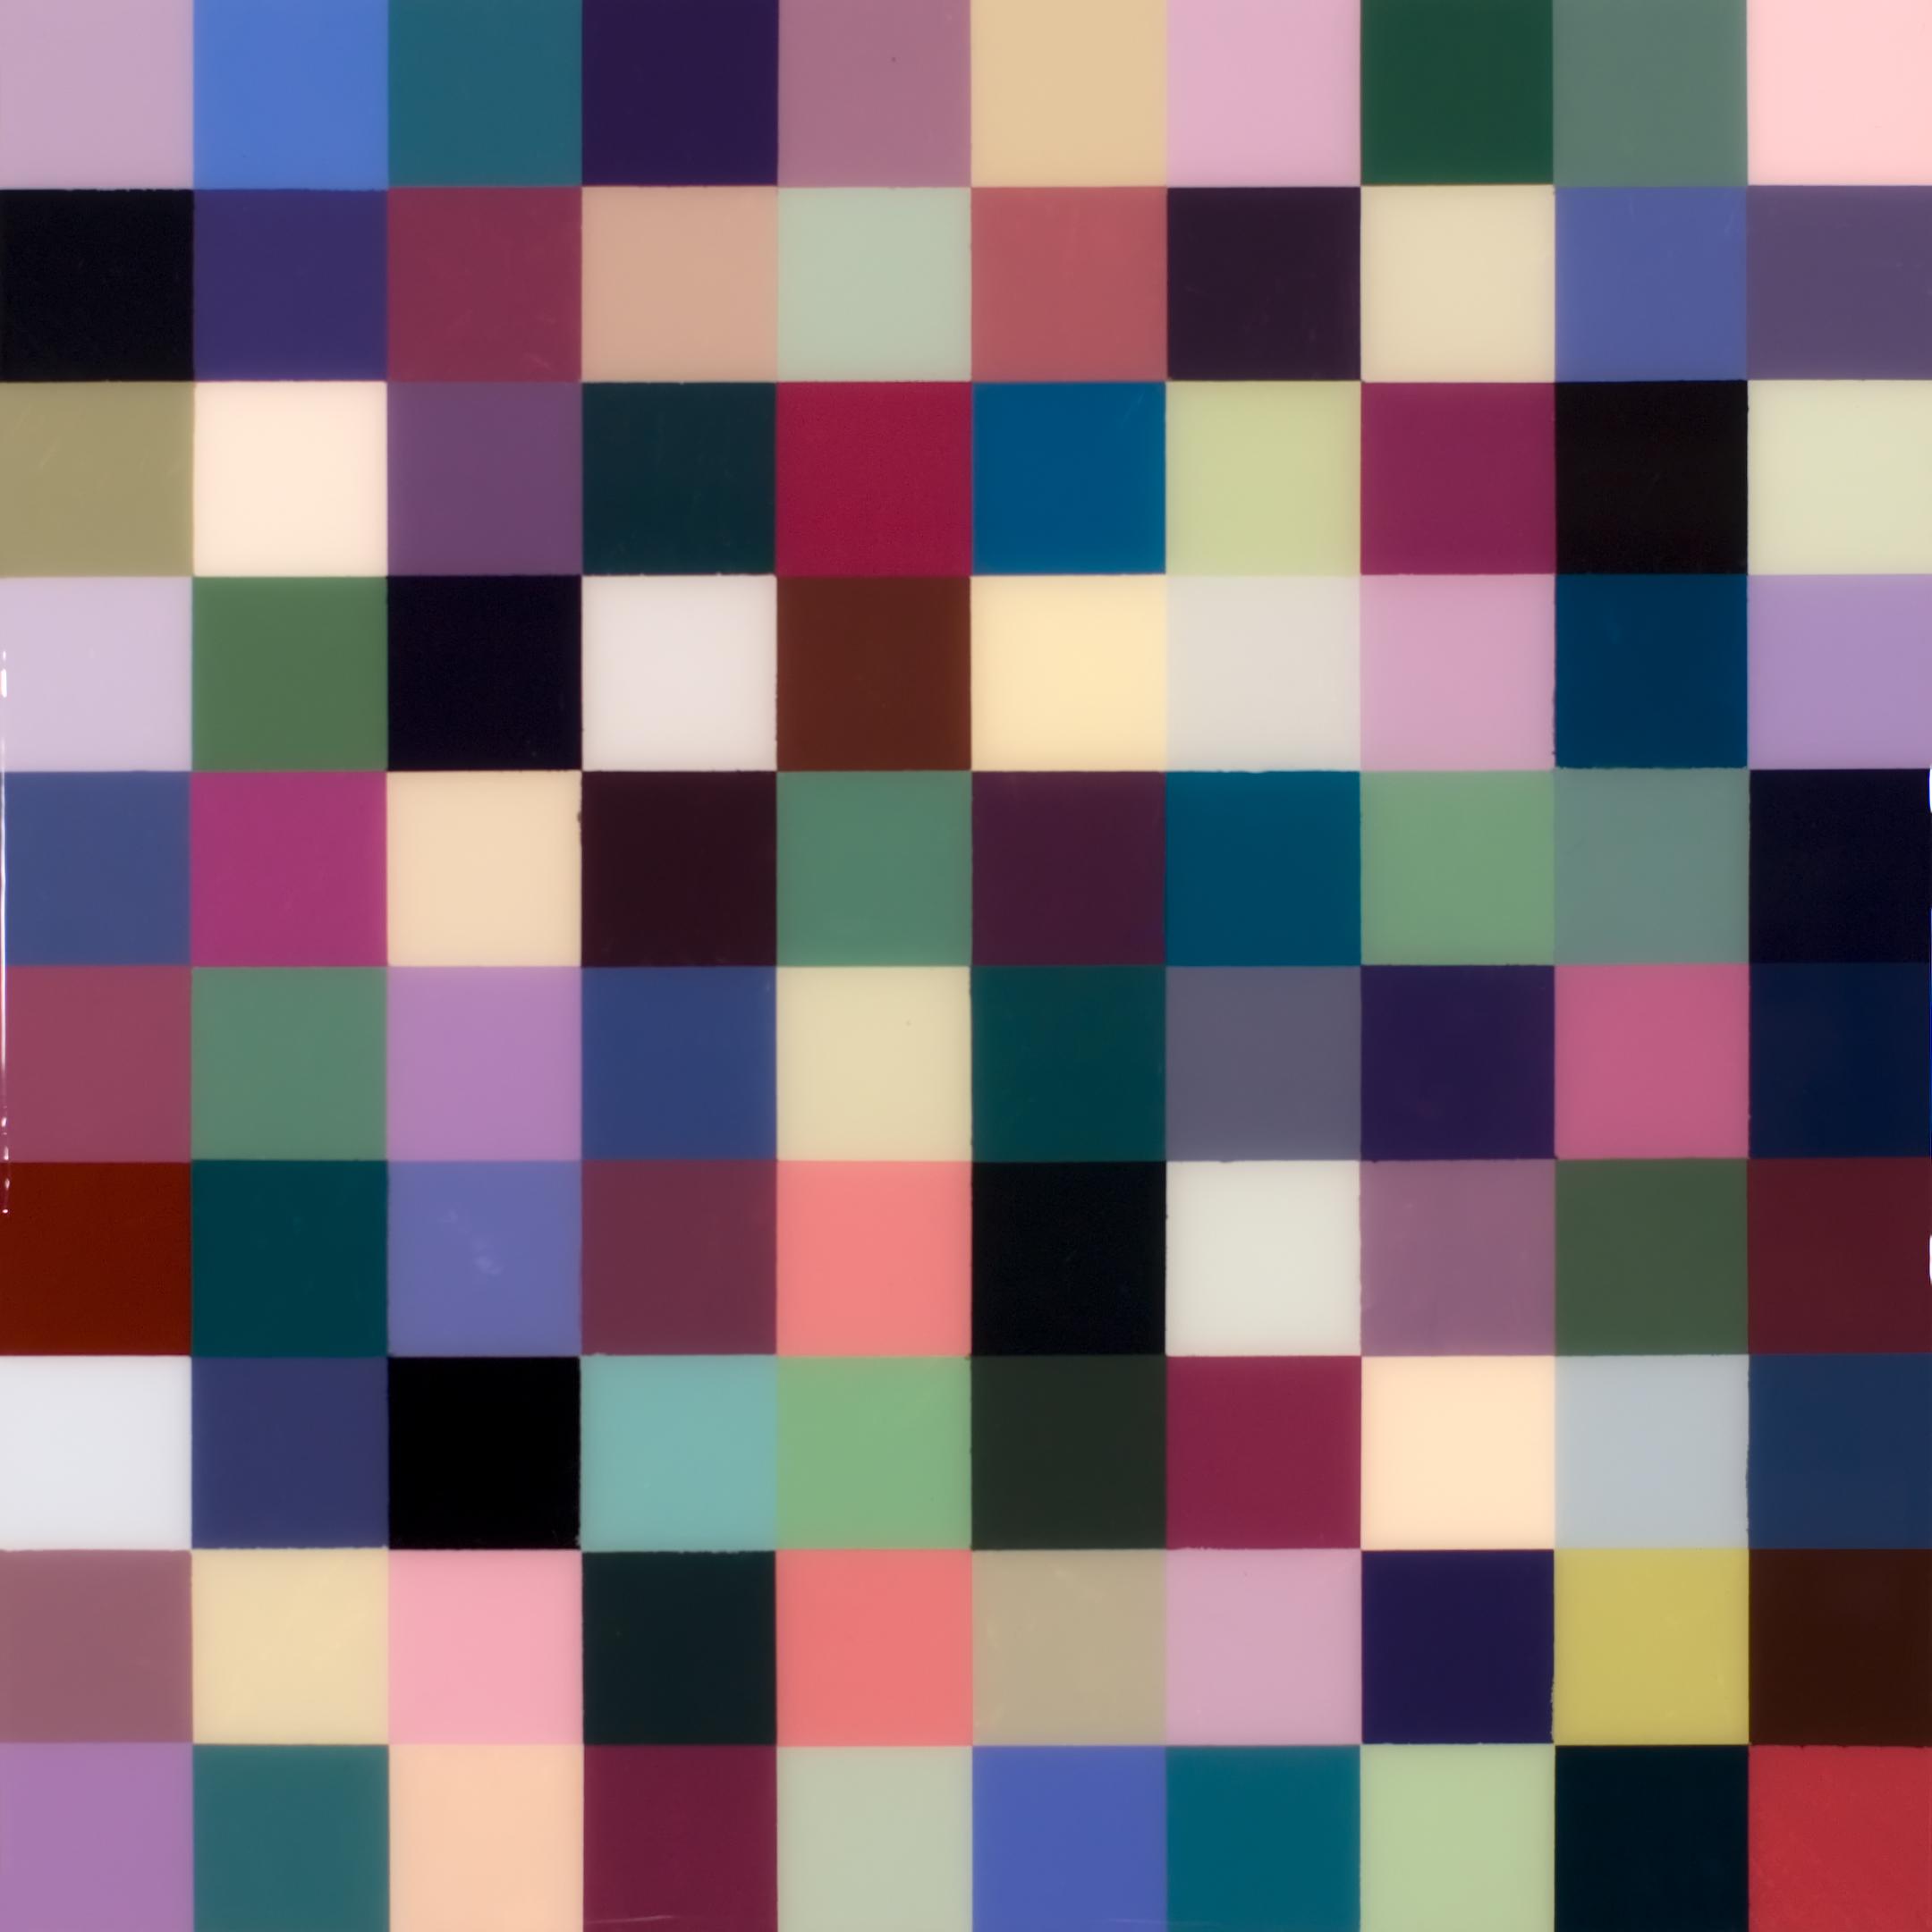 Abe_colorstudy01.jpg